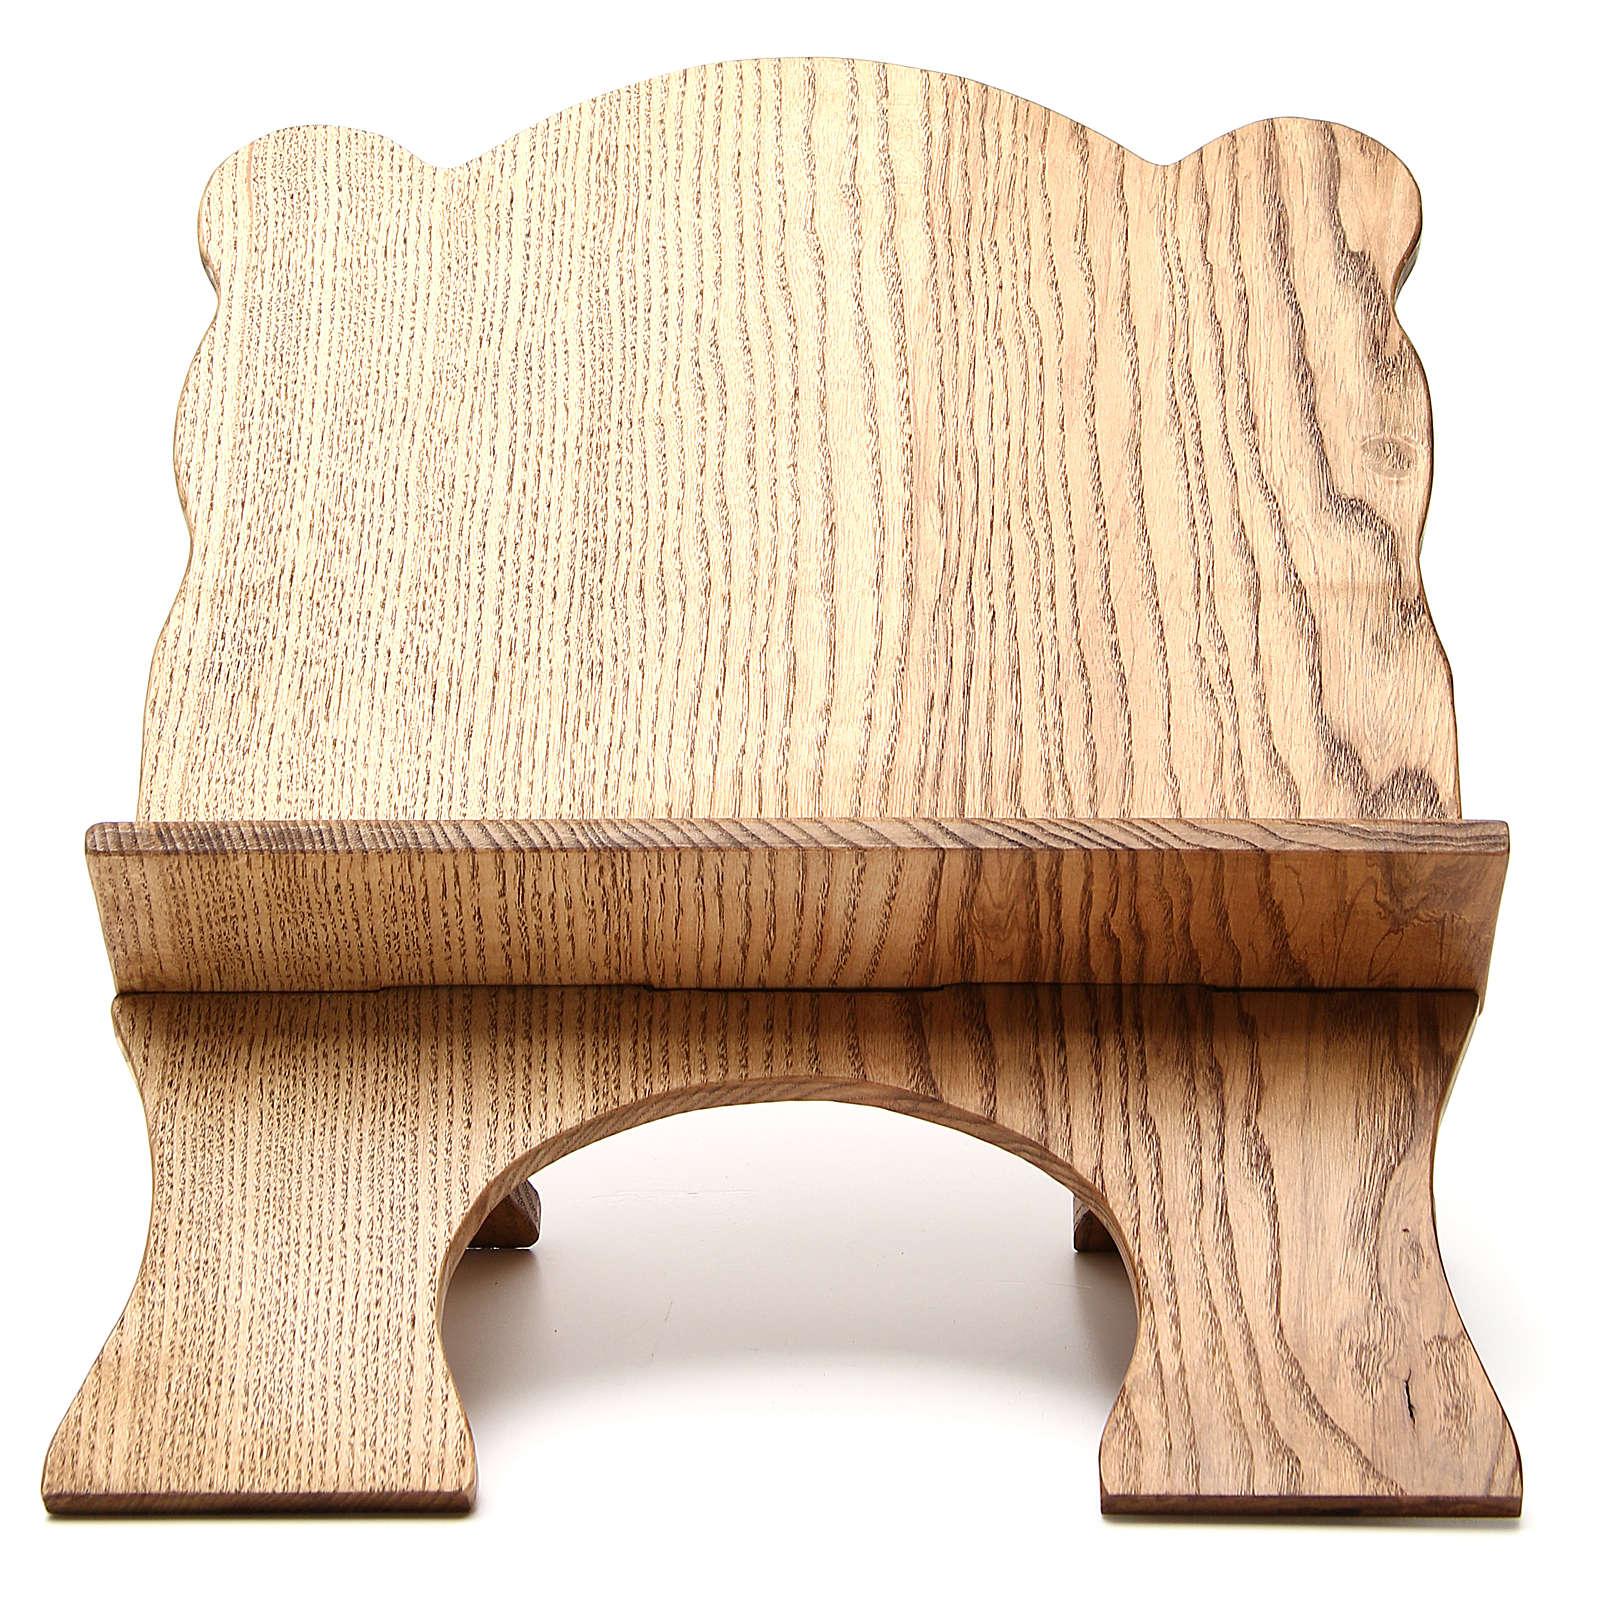 Leggio tavolo frassino chiaro semplice Monaci Betlemme 4